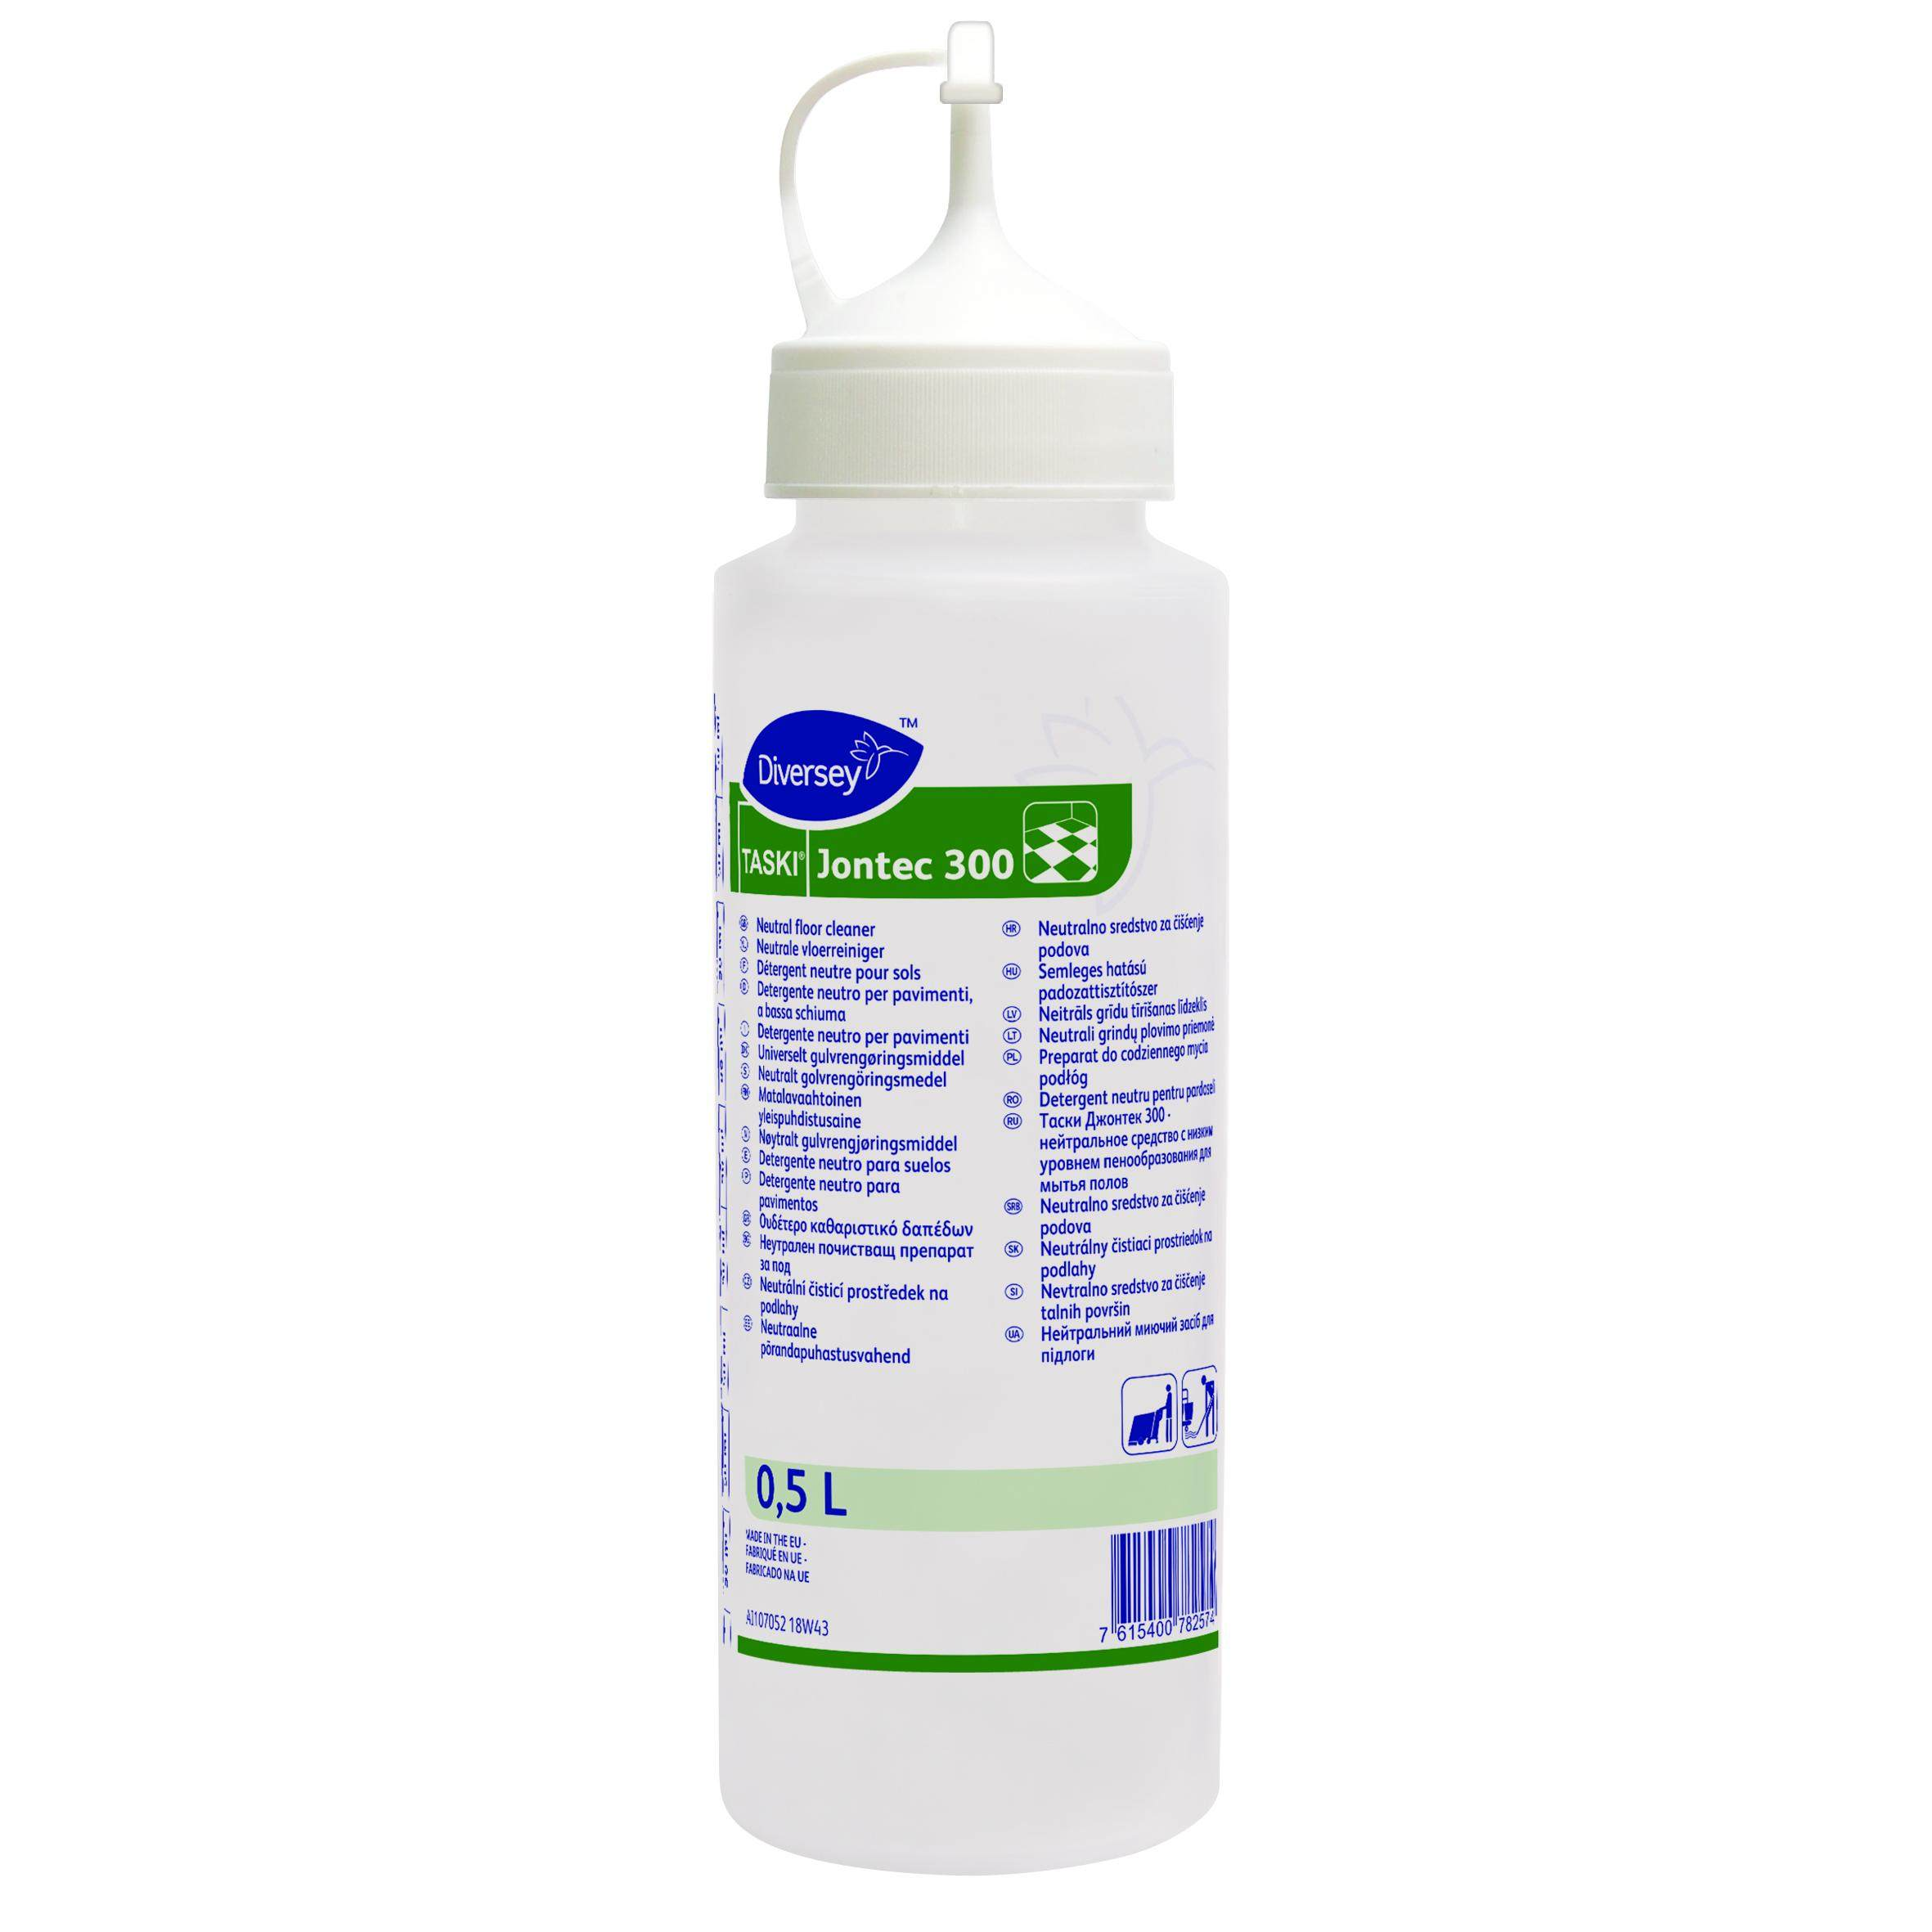 7513979-TASKI-Jontec-300-Dosing-bottle-CMYK-20x20cm.jpg